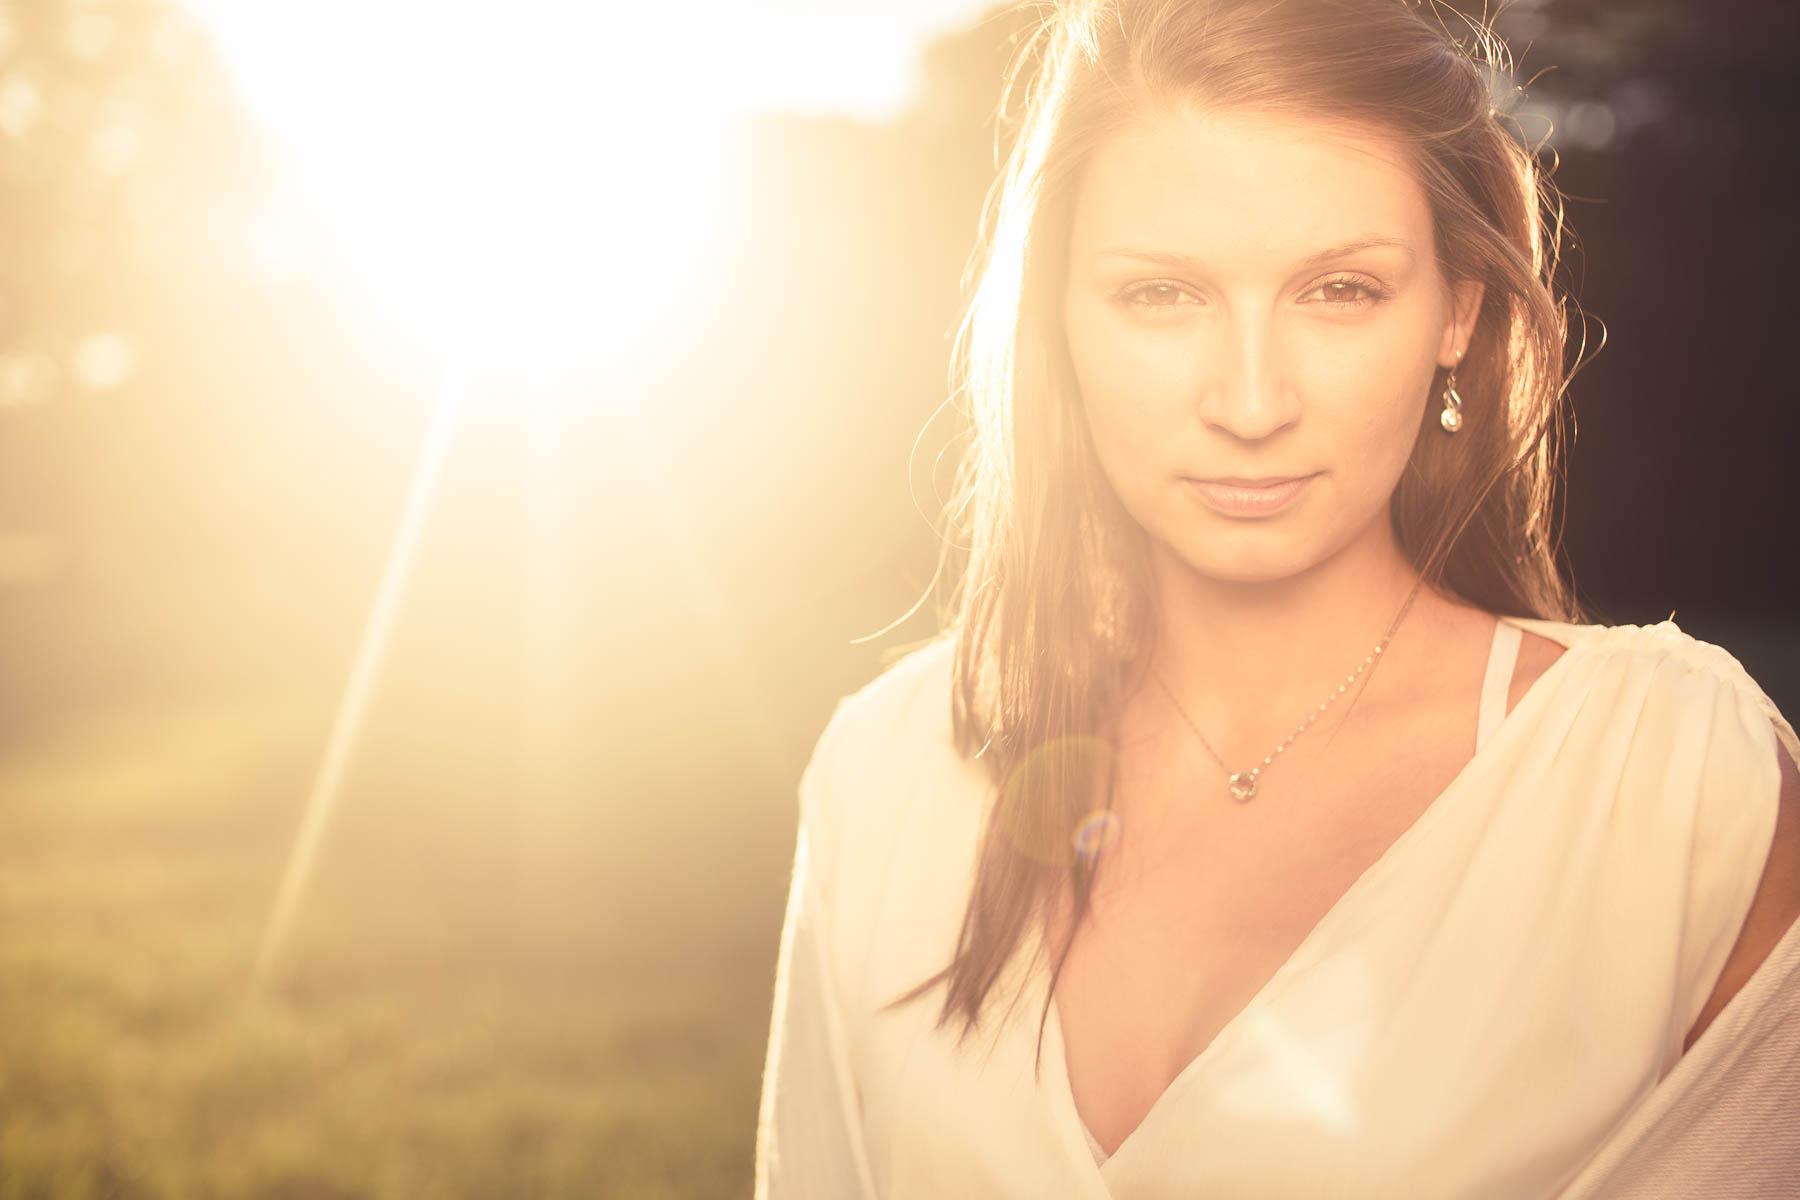 Fotoshooting im Freien - Abendsonne